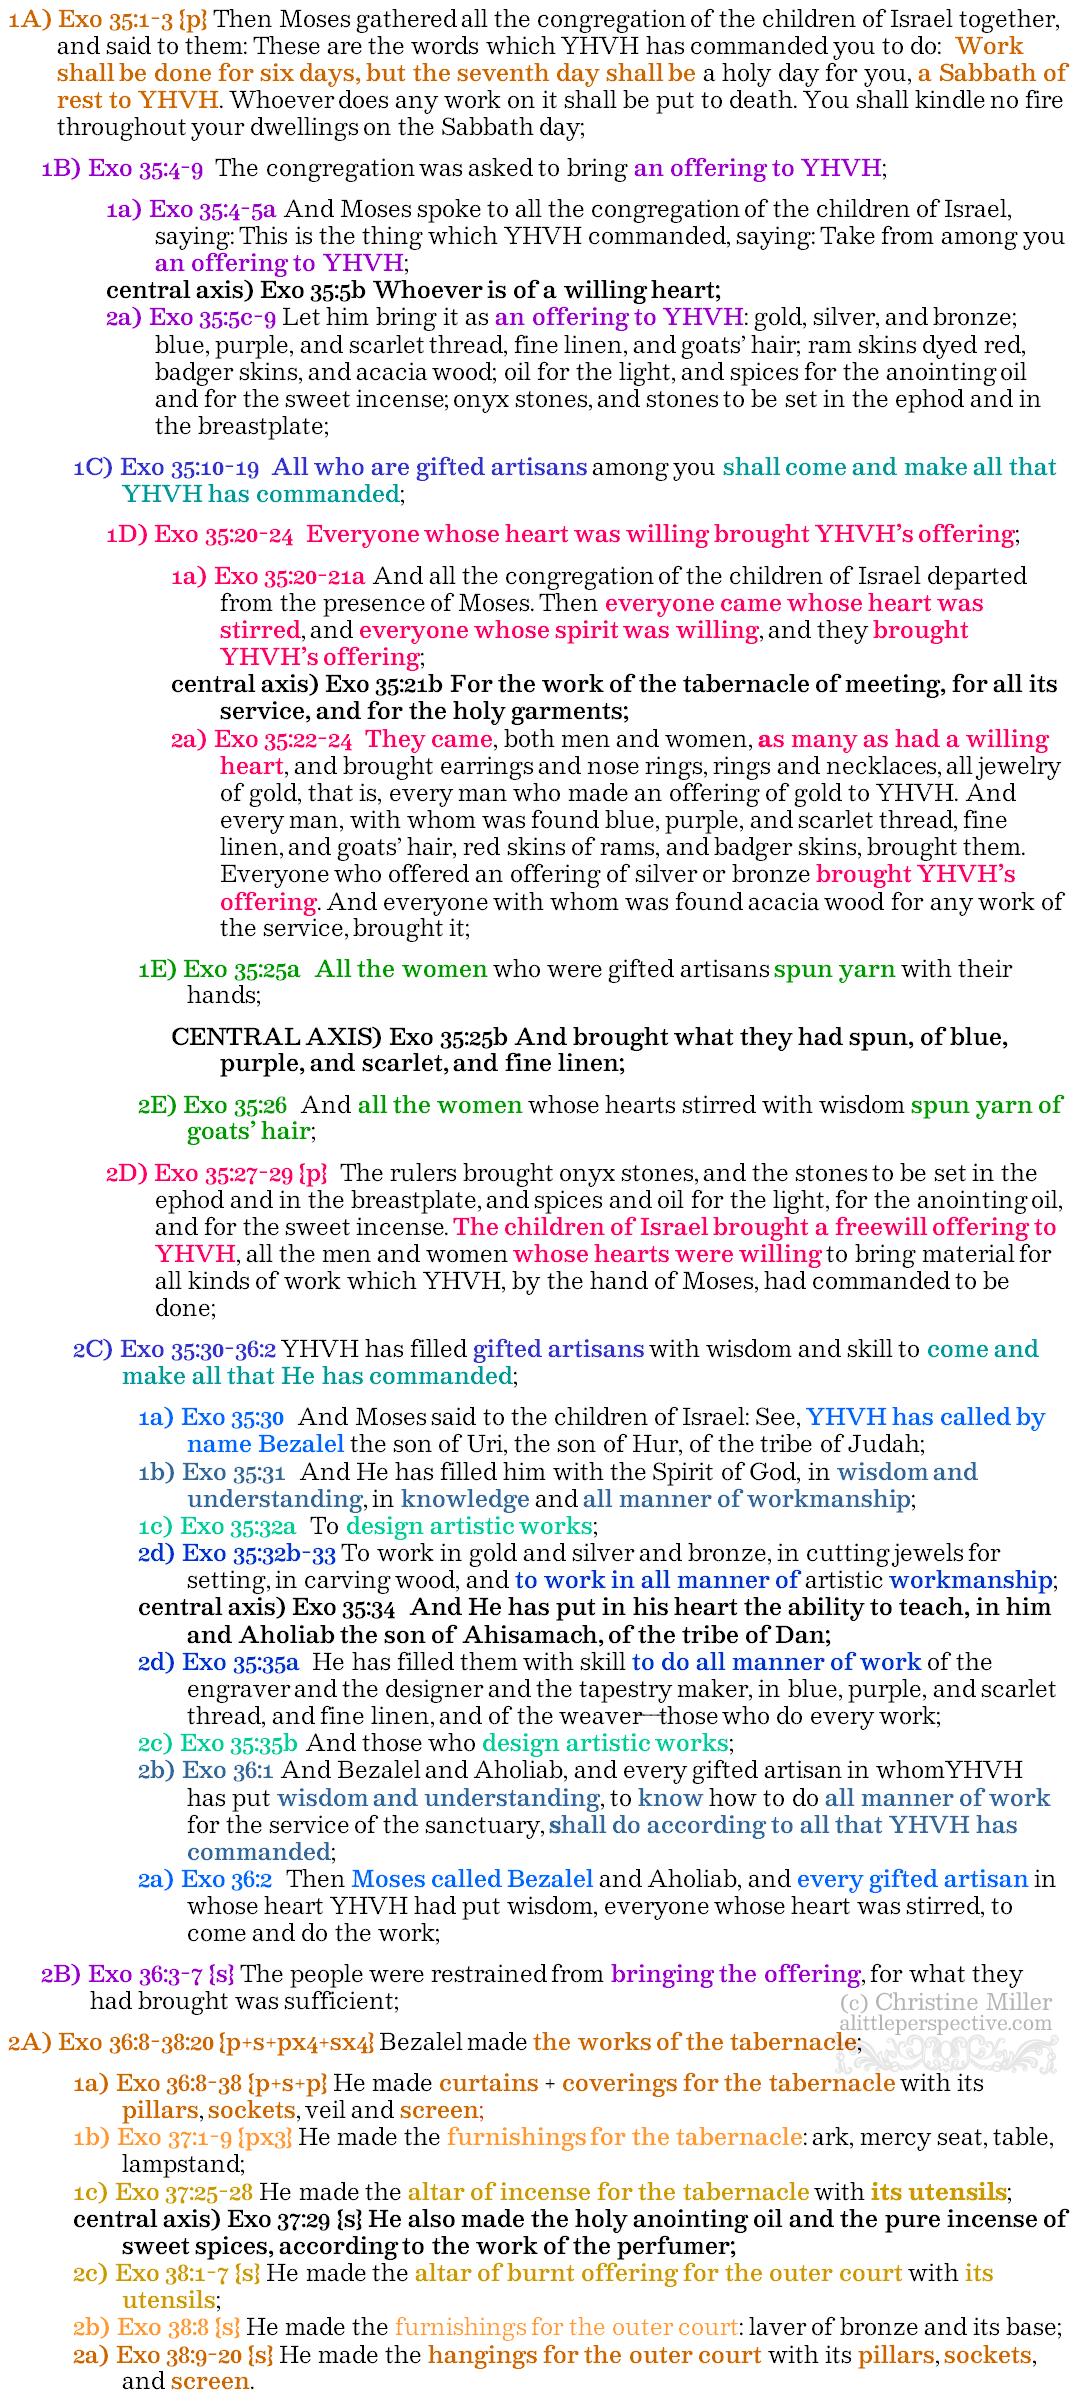 Exo 35:1-38:20 vayakhel chiasm | christine's bible study at alittleperspective.com